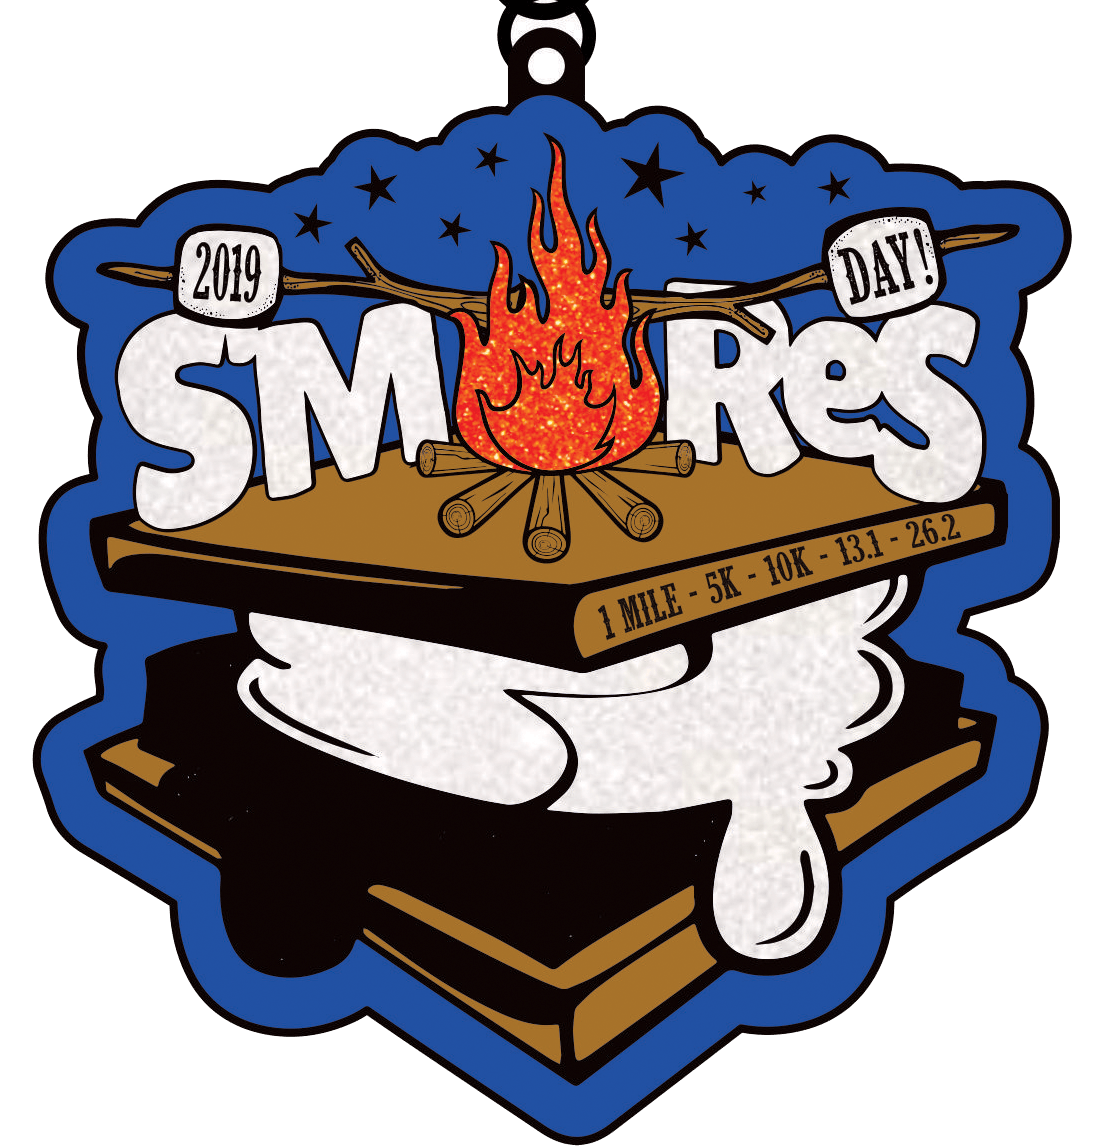 2019 Smores Day 1 Mile 5K 10K 13.1 26.2 -Pittsburgh